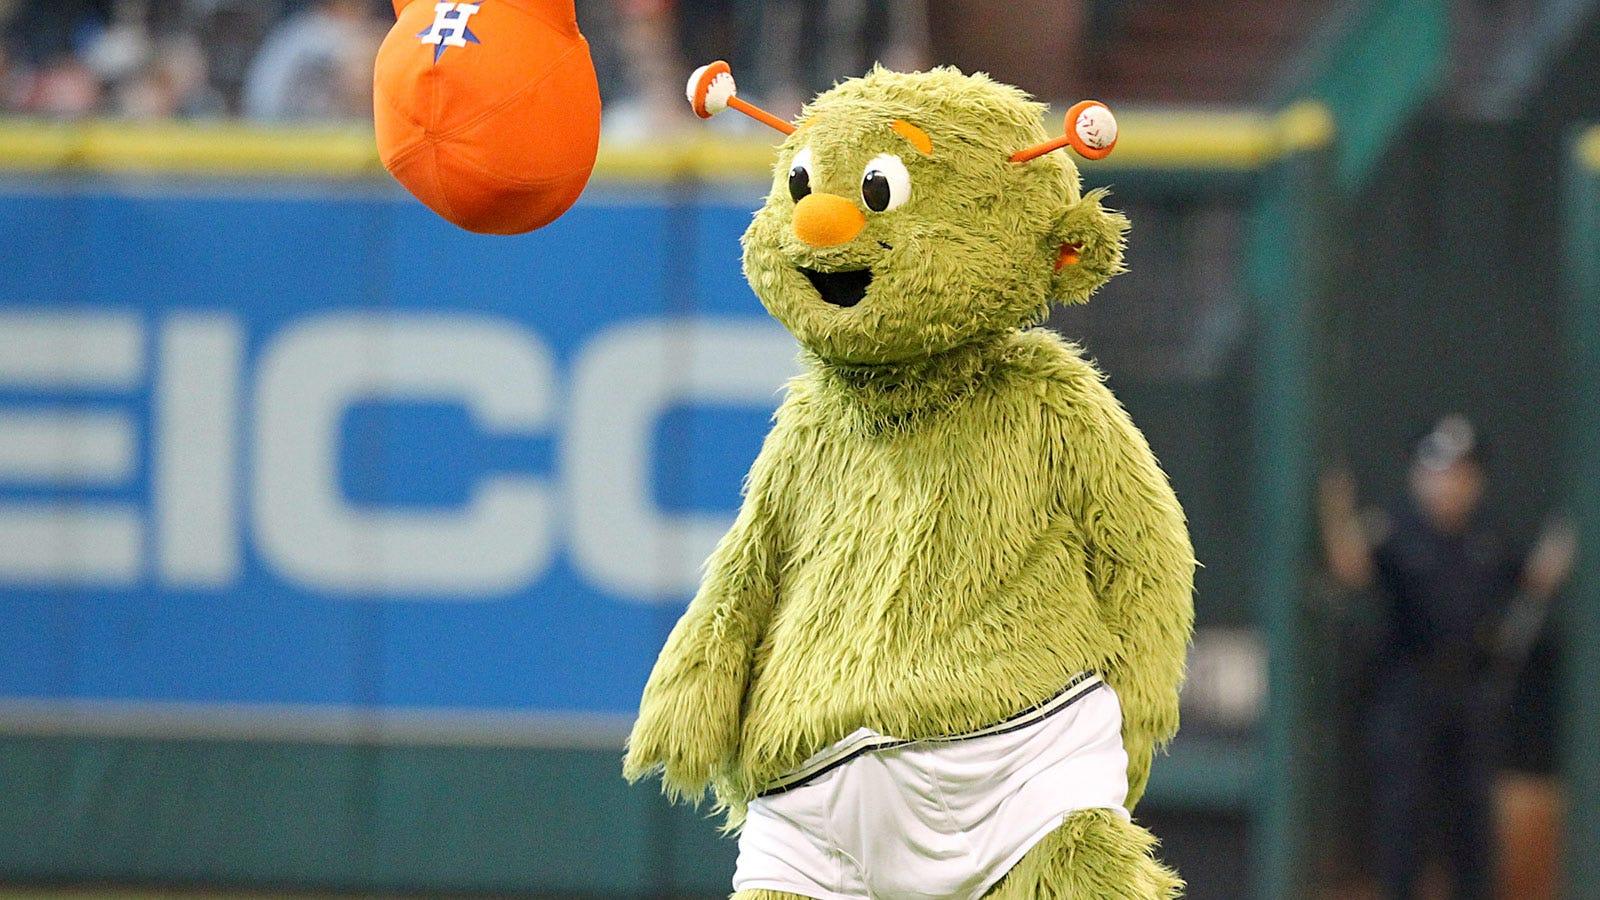 Astros Mascot >> Astros Mascot Orbit Celebrates Birthday With Wacky Antics